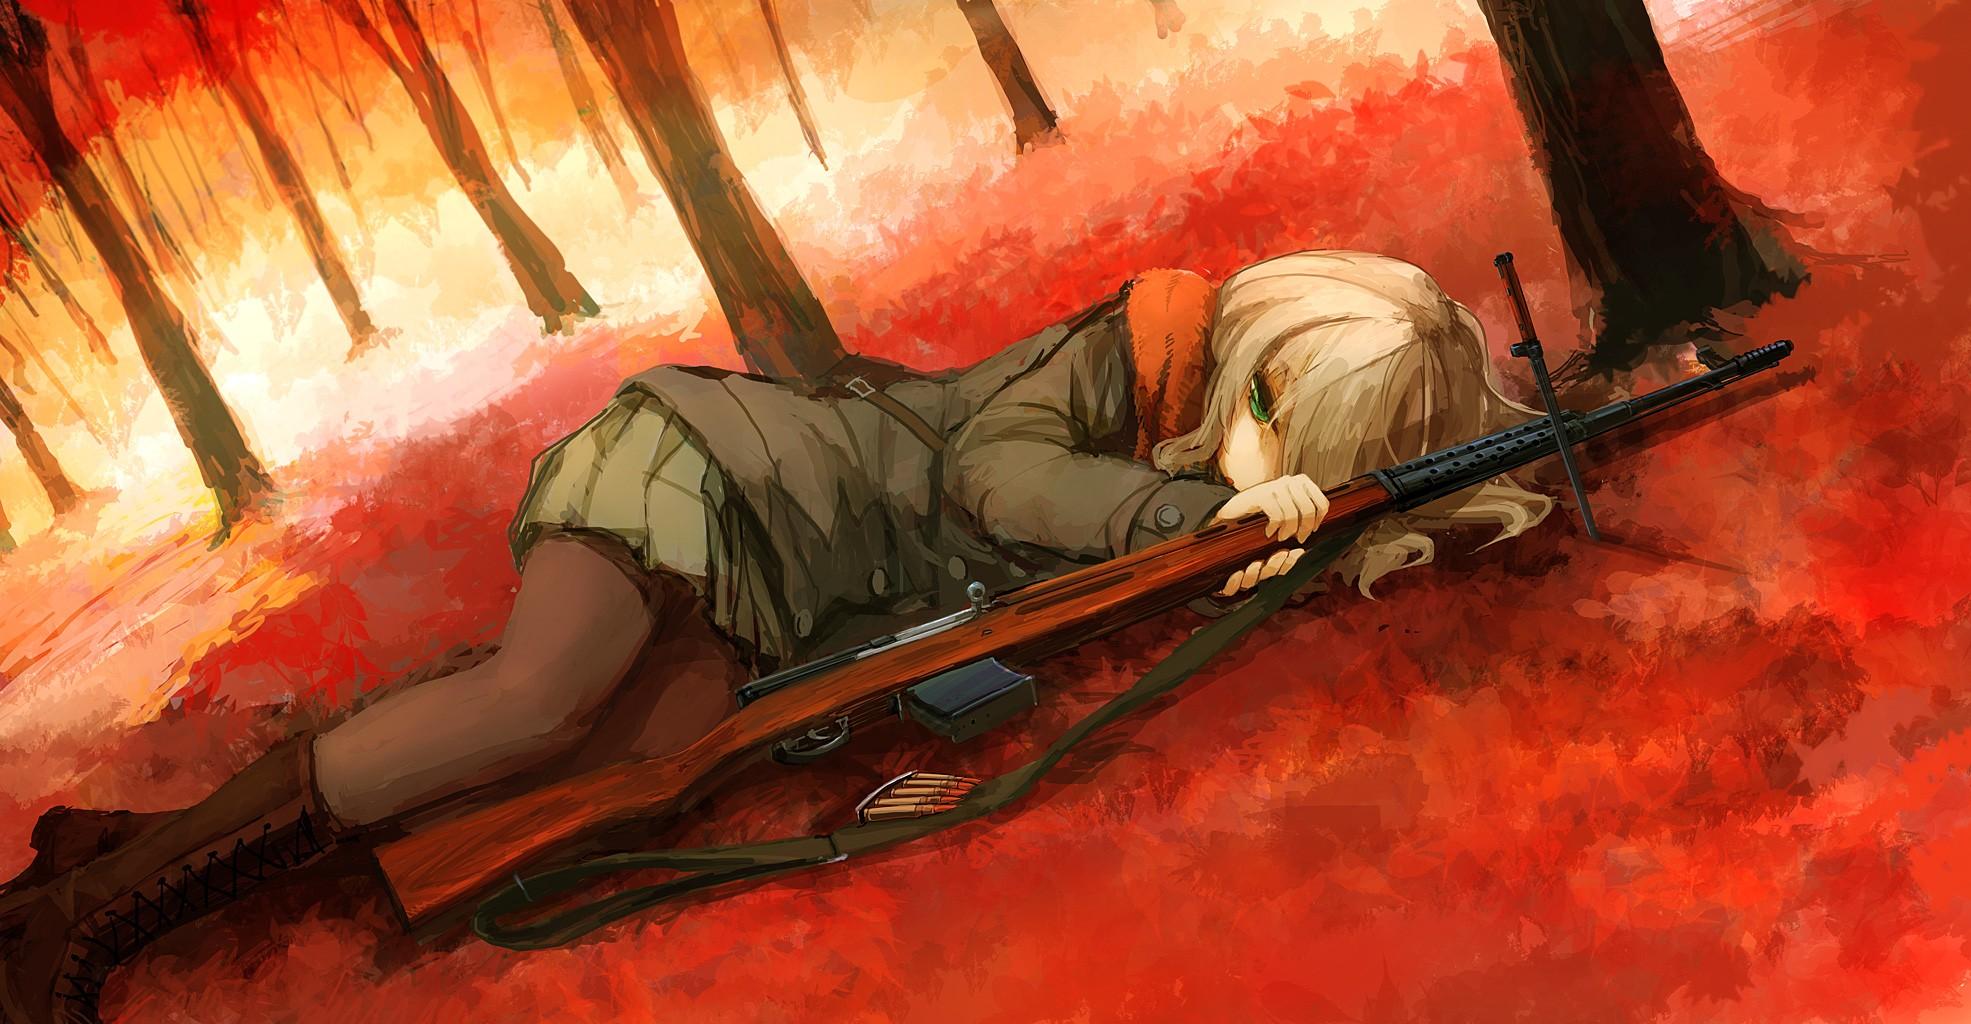 Anime 1971x1024 anime girls anime fall weapon rifles